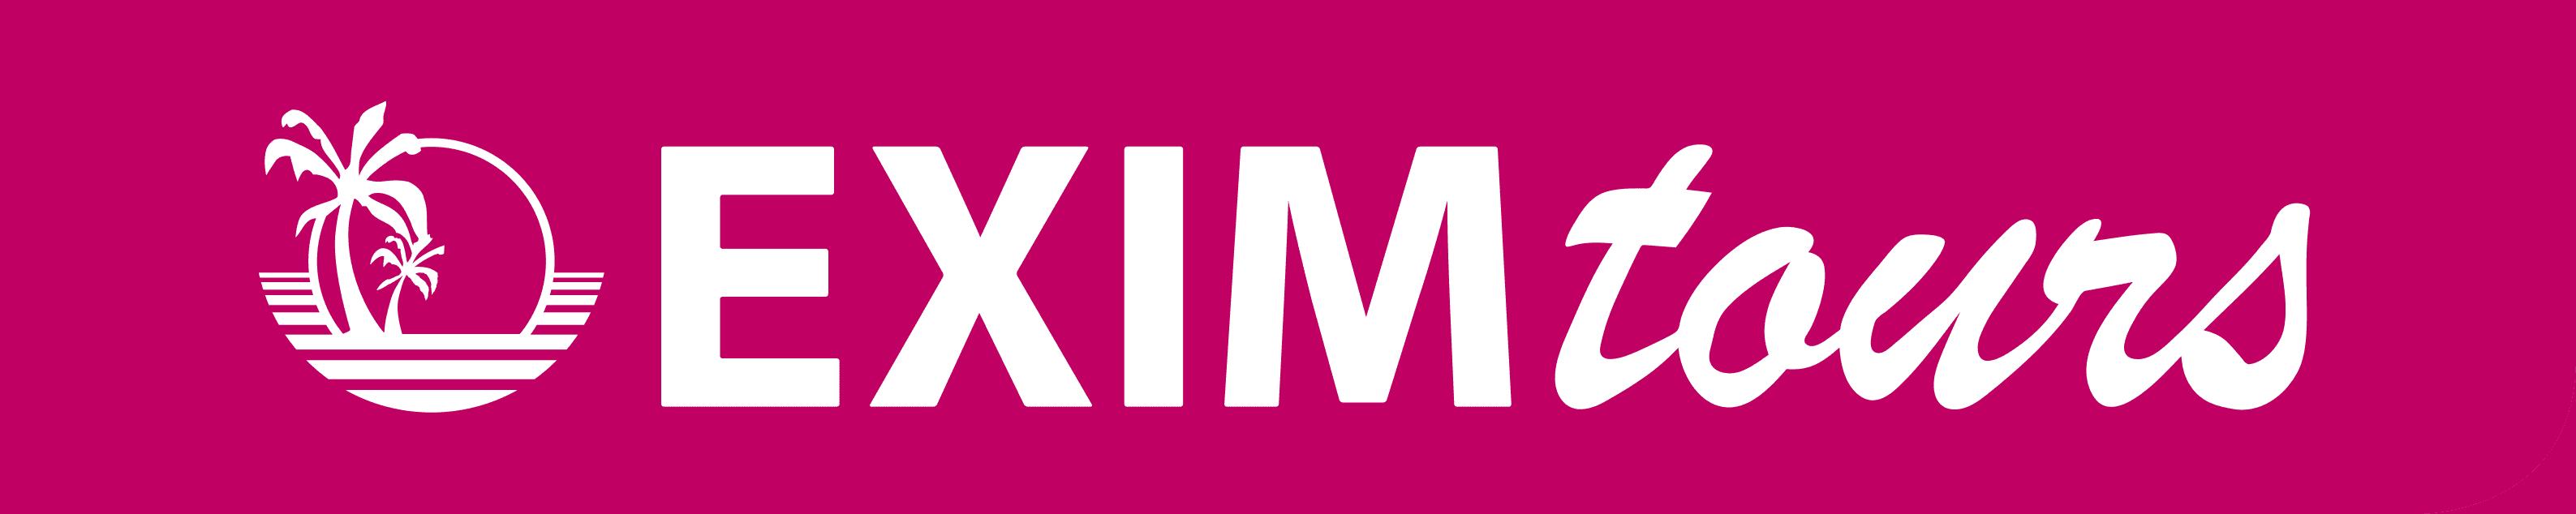 CK Exim Tours - logo